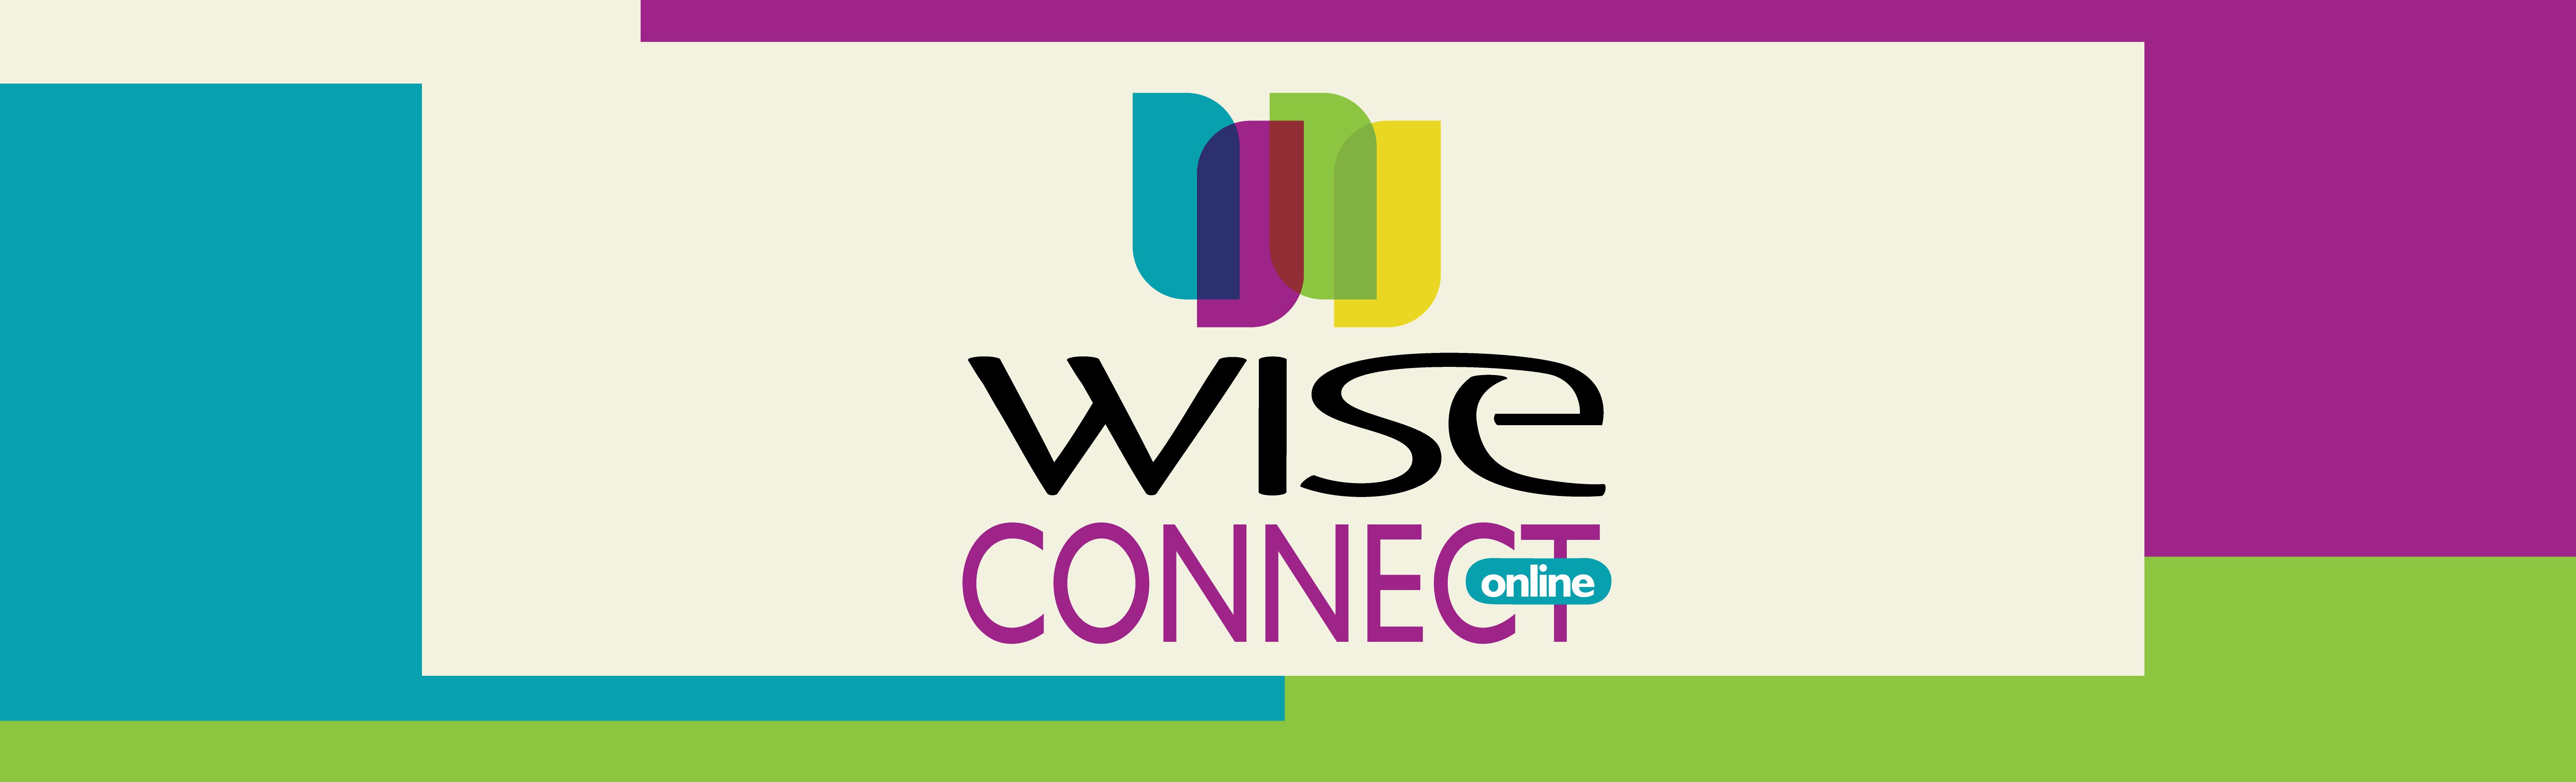 2021 WISE Logo Header connect online